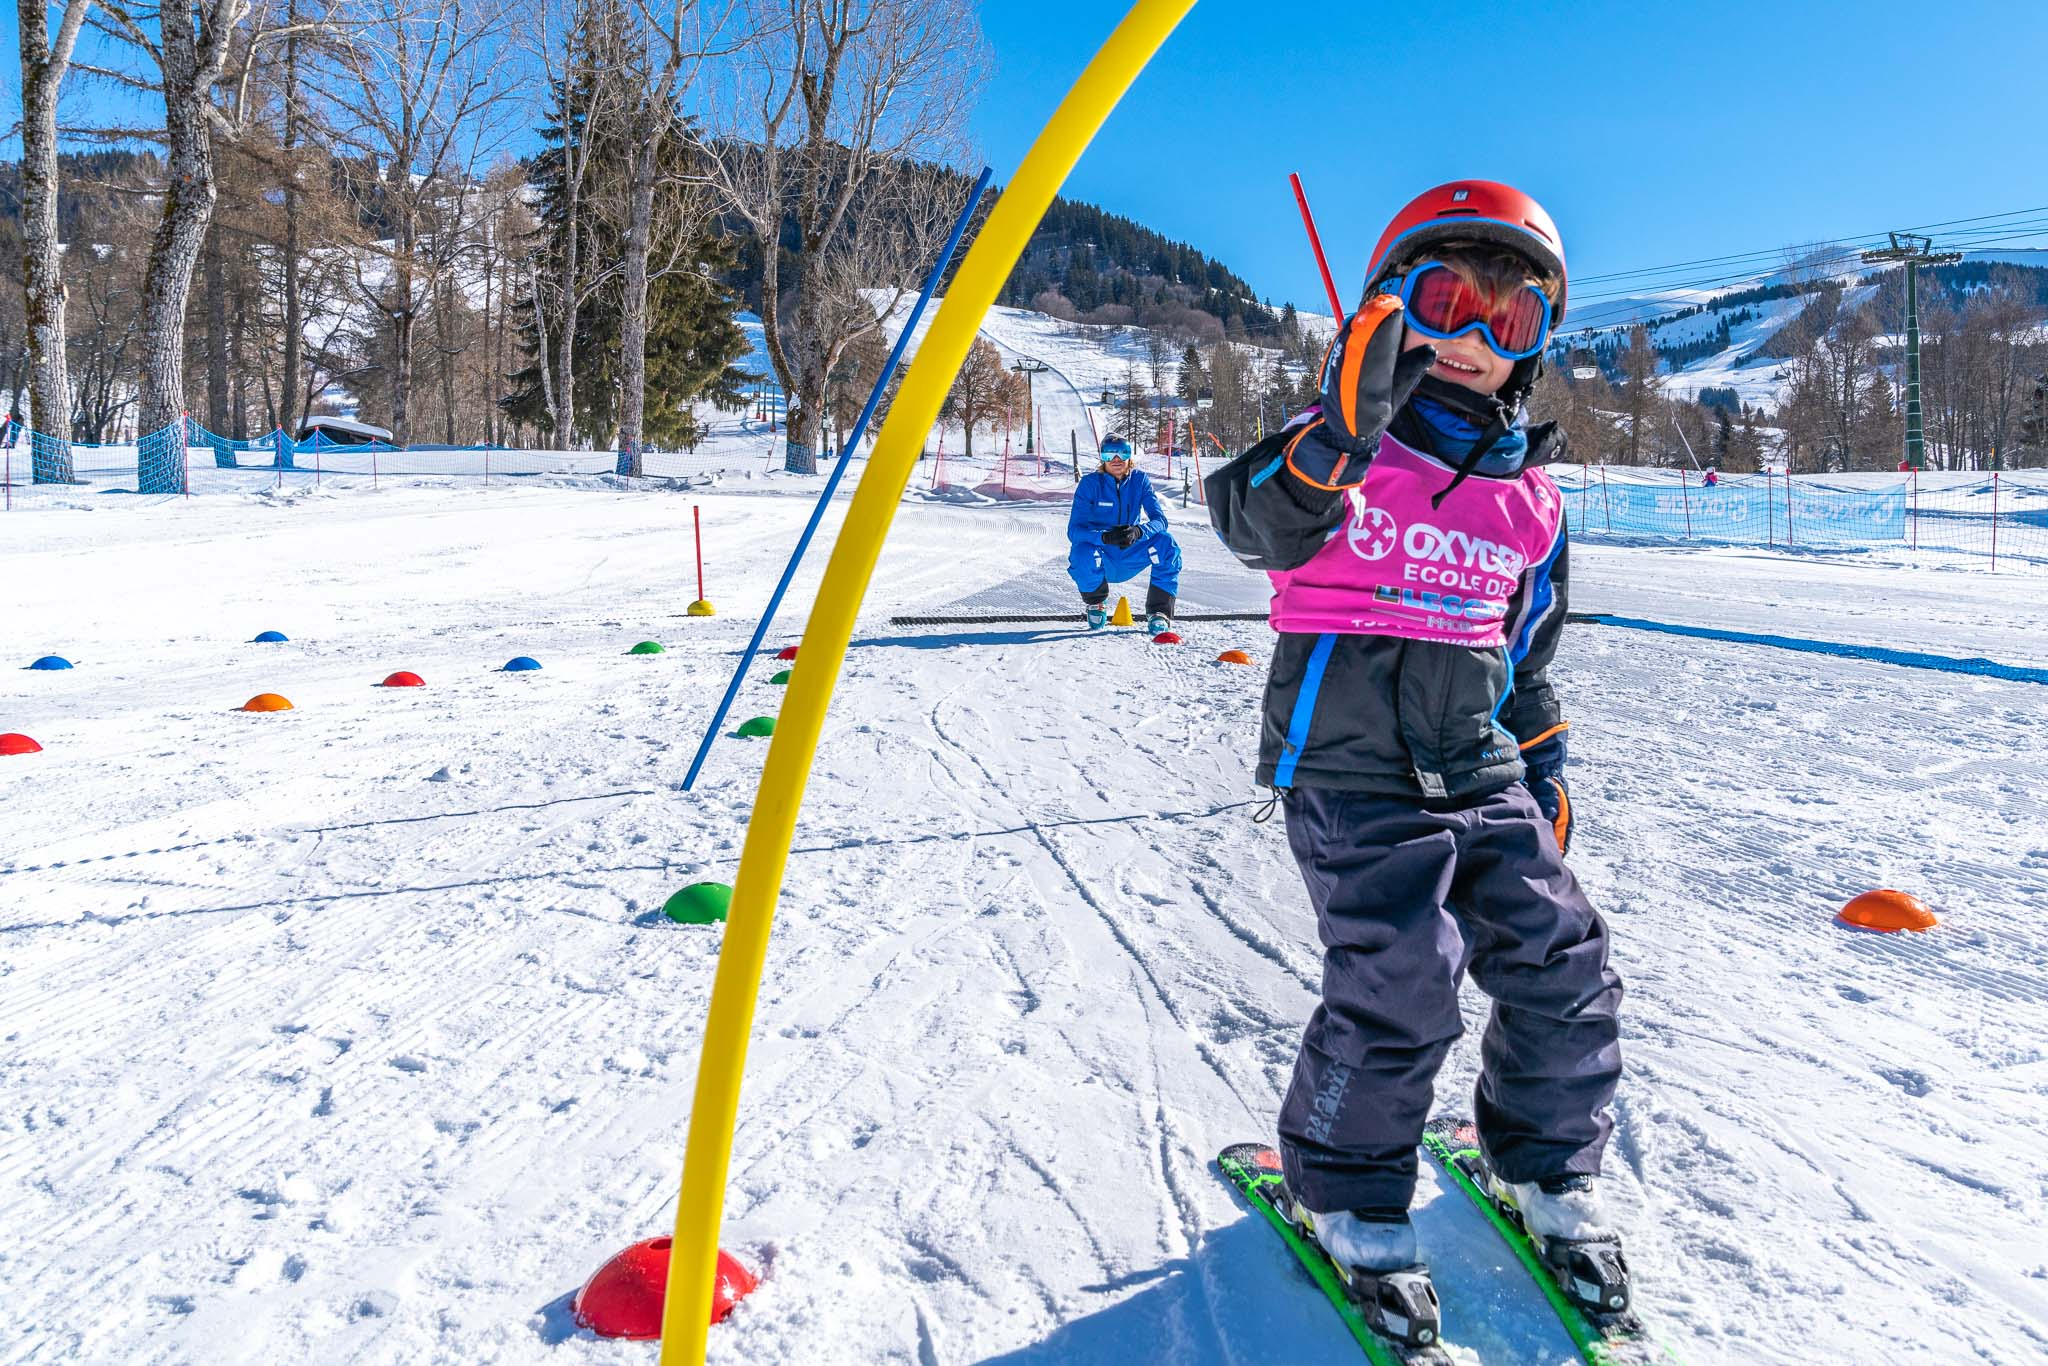 Oxygene ski lessons in Megeve